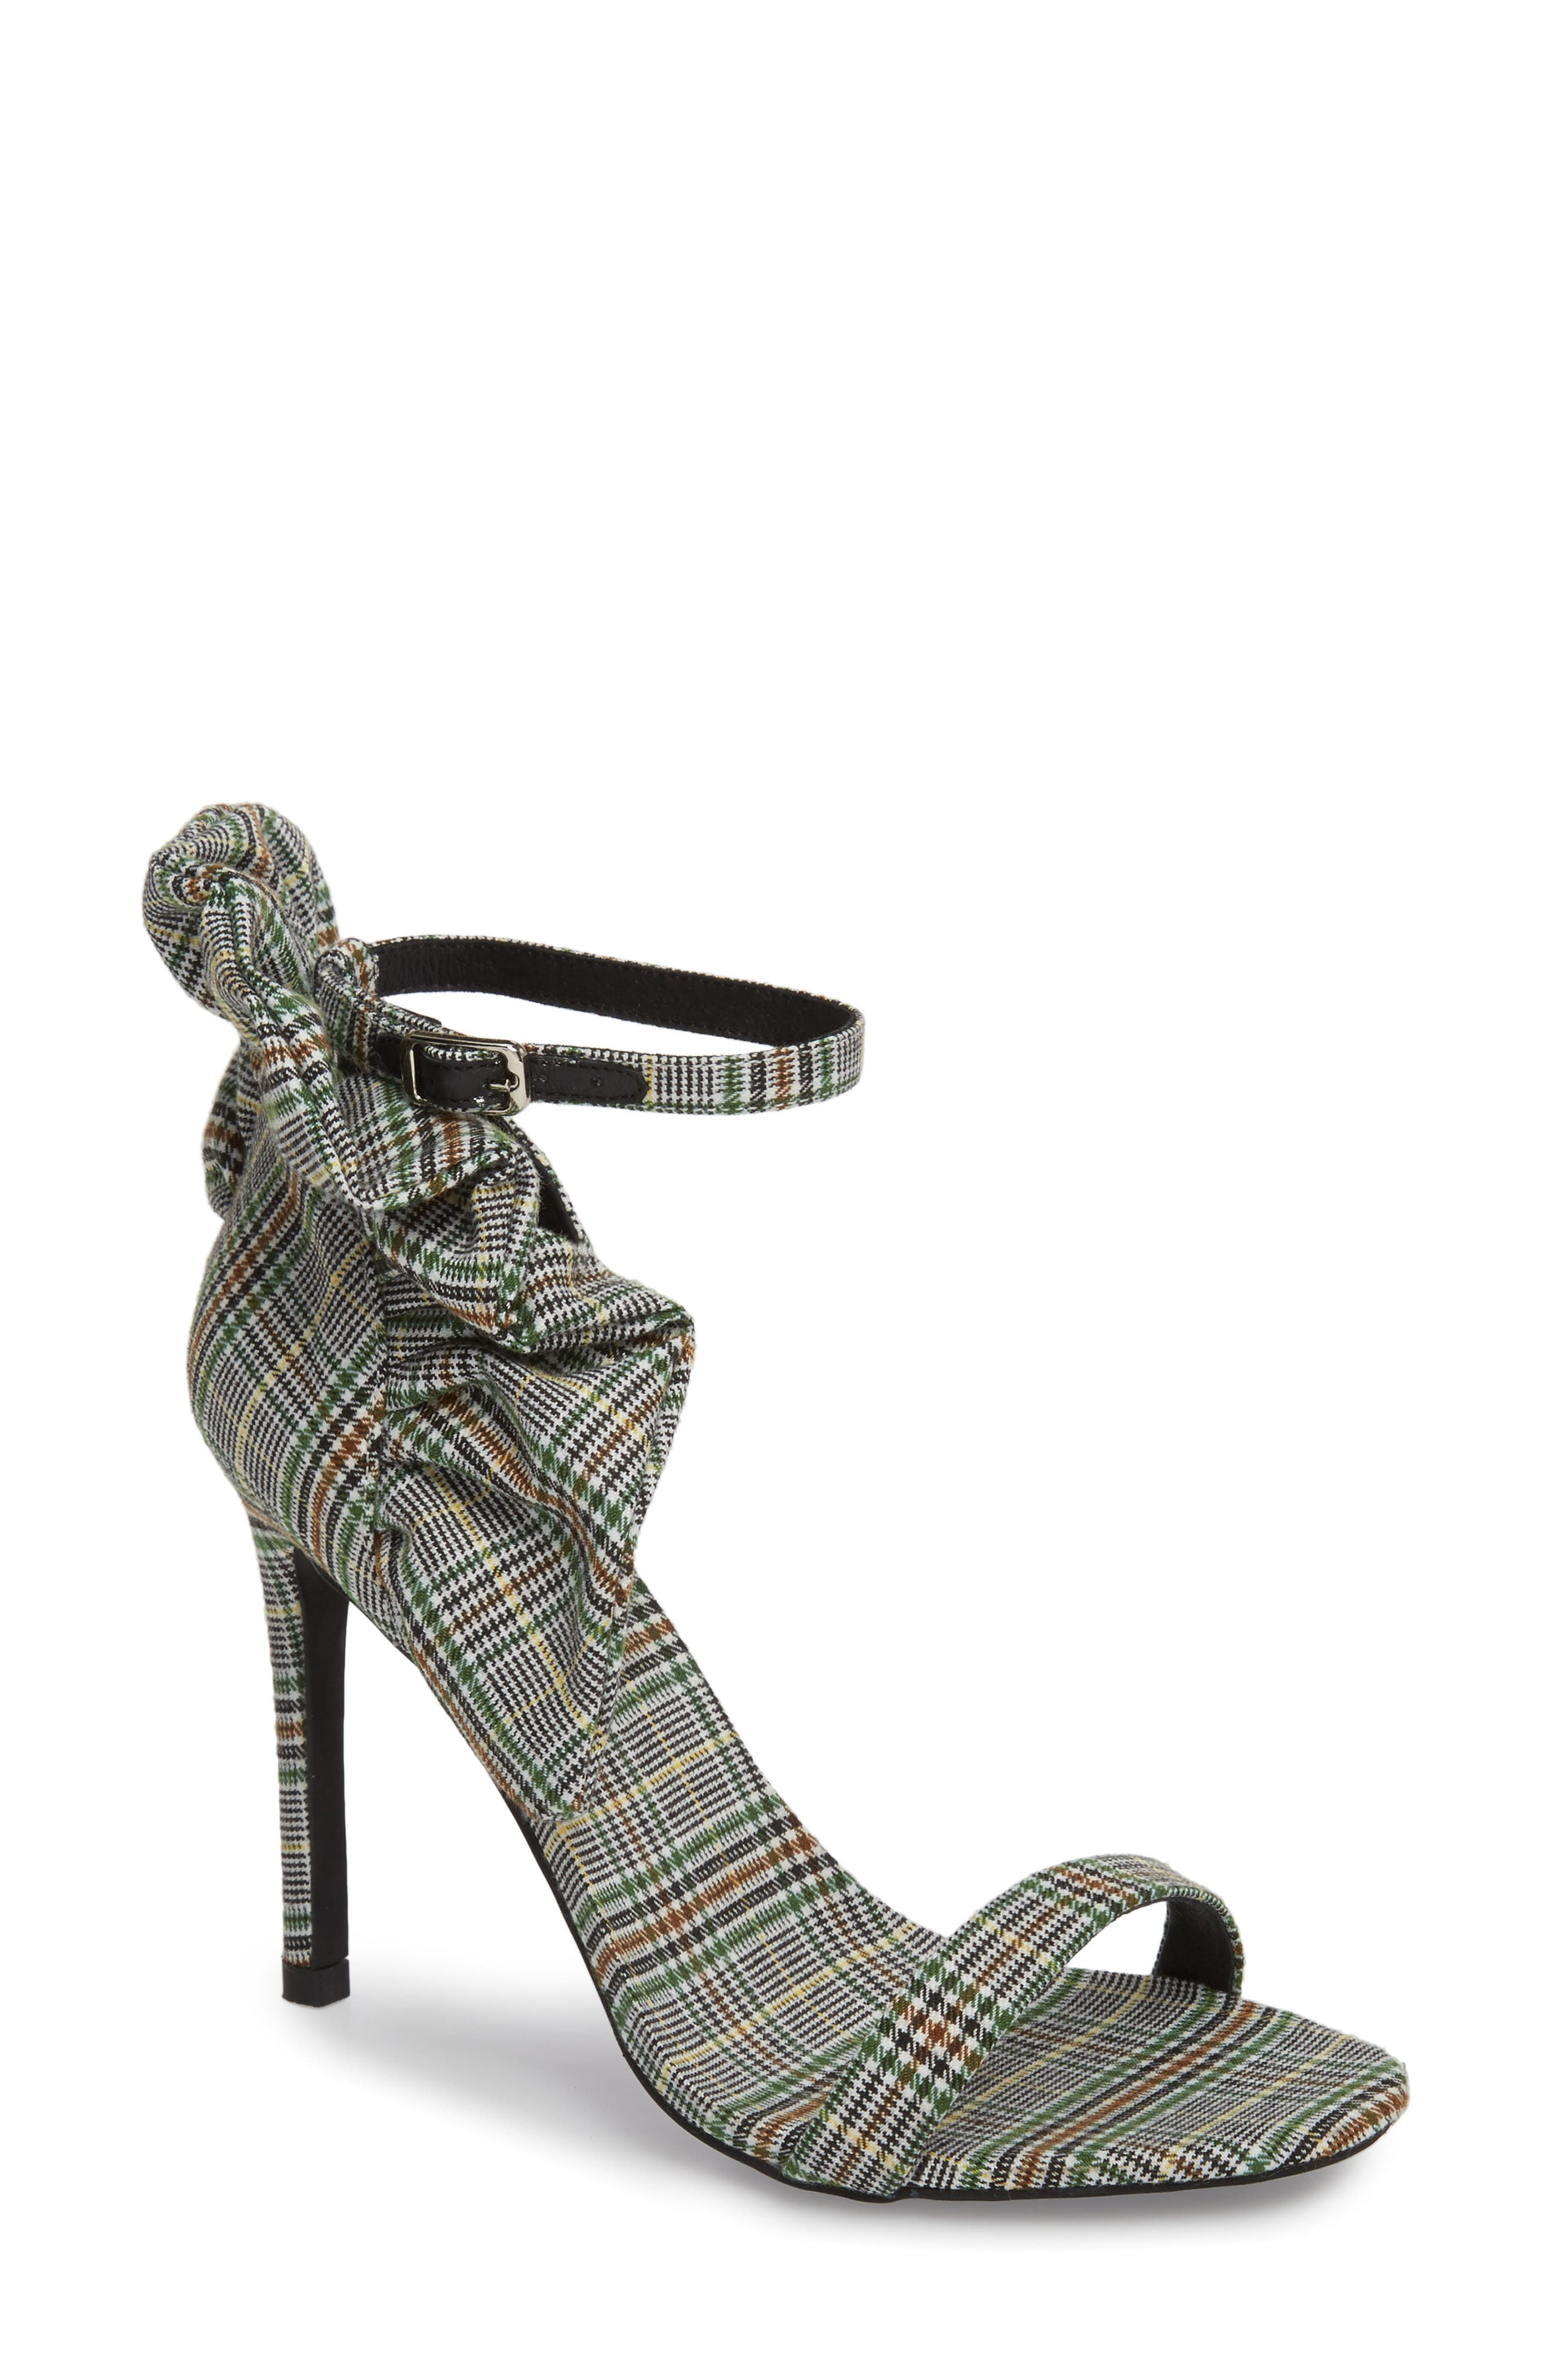 Cheshire Ruffle Sandal,                         Main,                         color, Black/ White/ Green Fabric